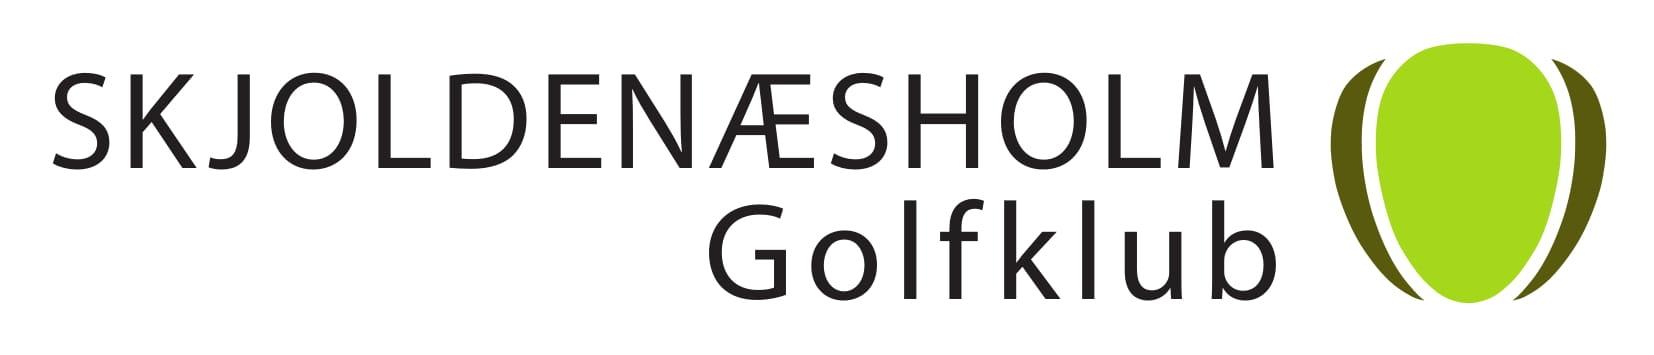 Skjoldenæsholm Golfklub